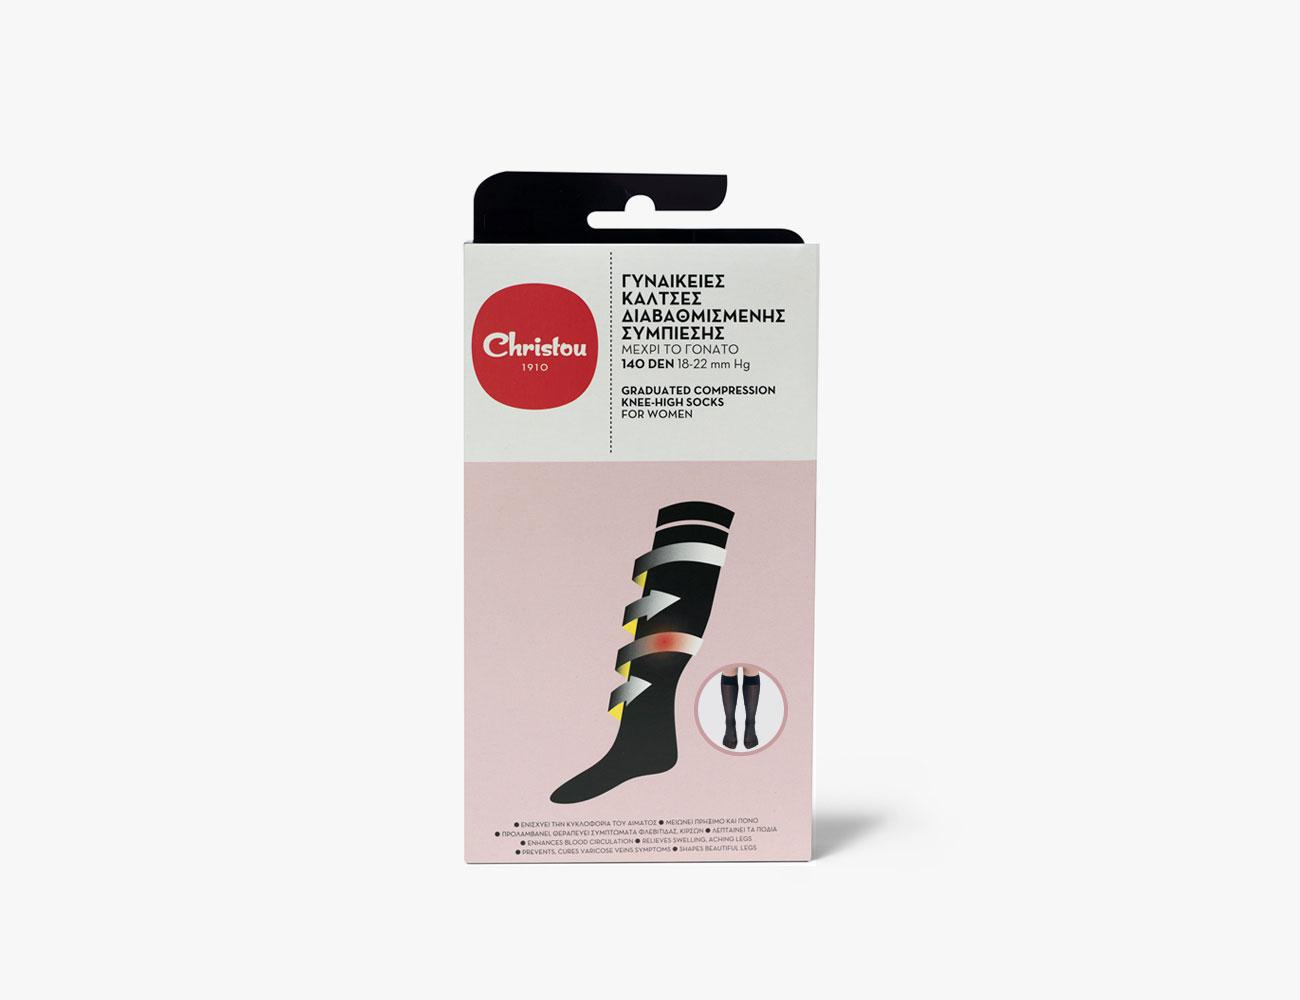 Graduated Compression Knee-High Socks for Women 140 DEN